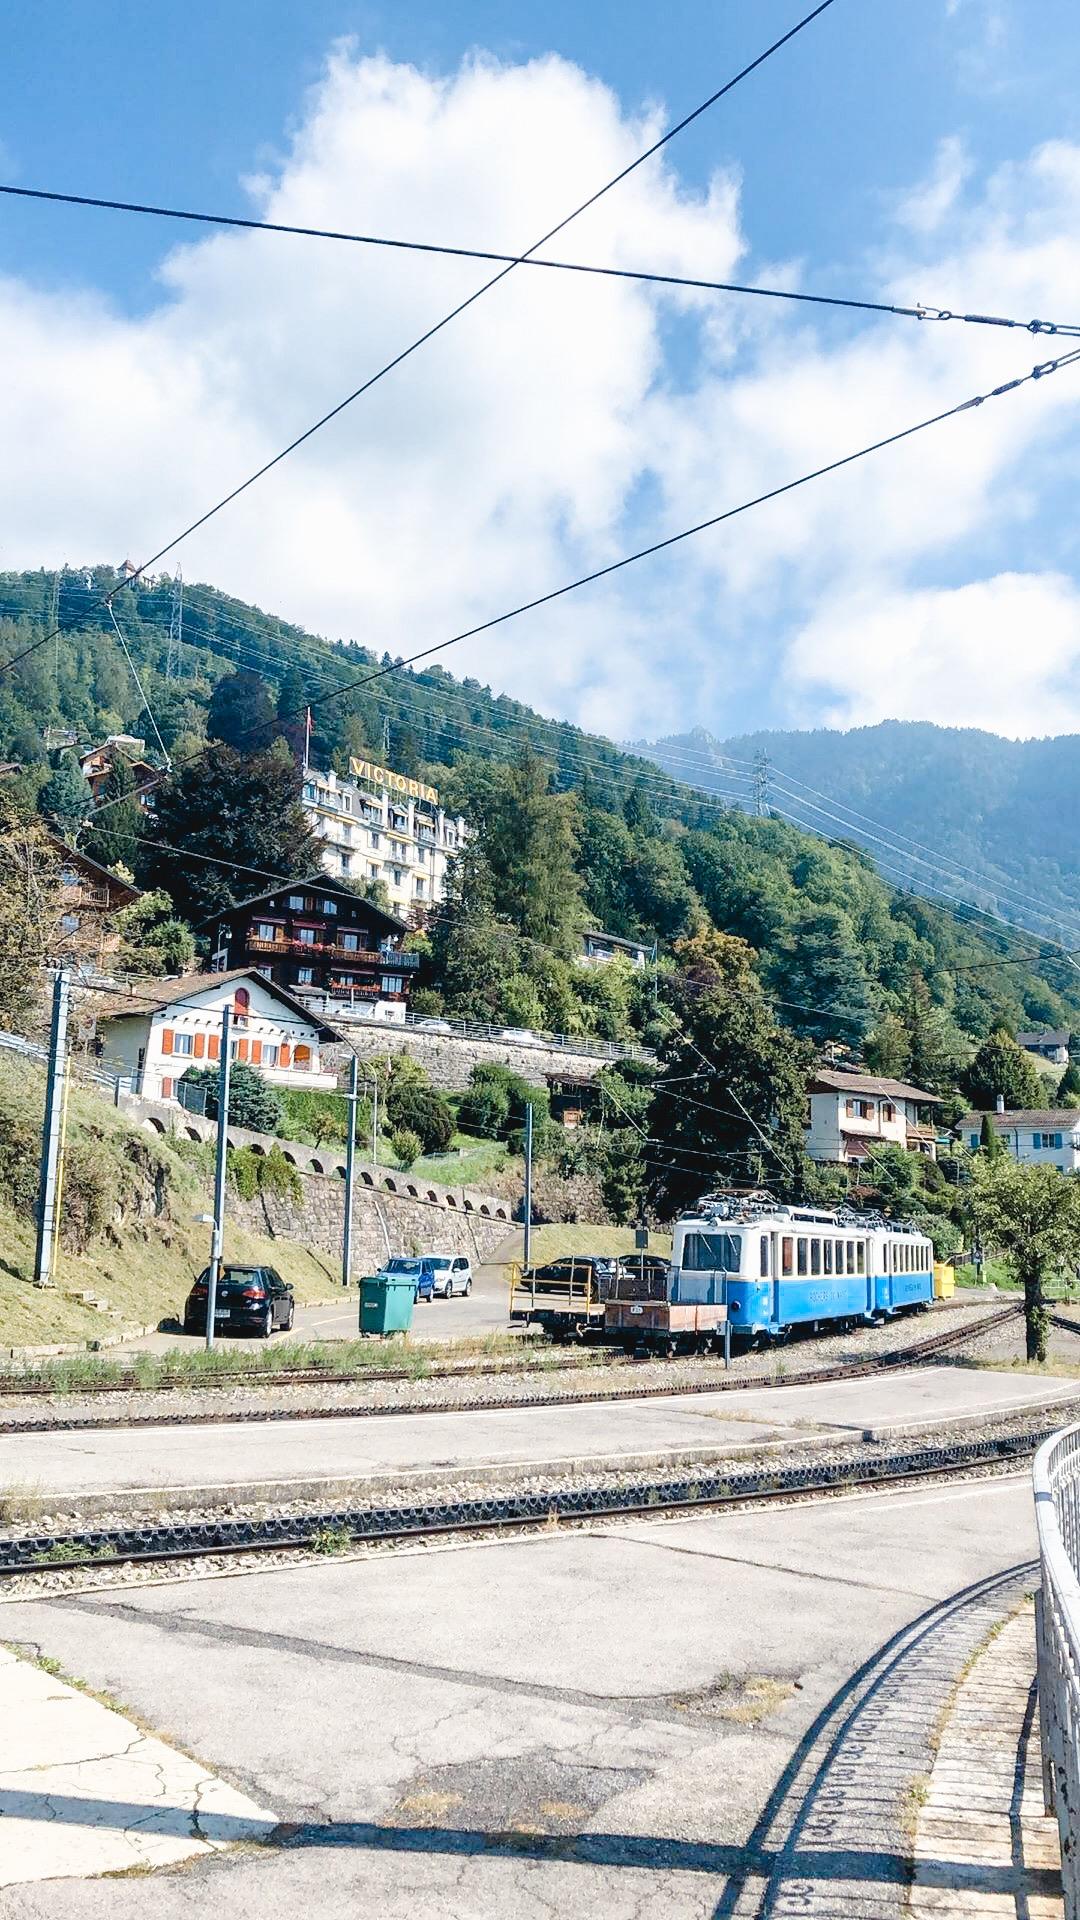 glion-train-station-montreux